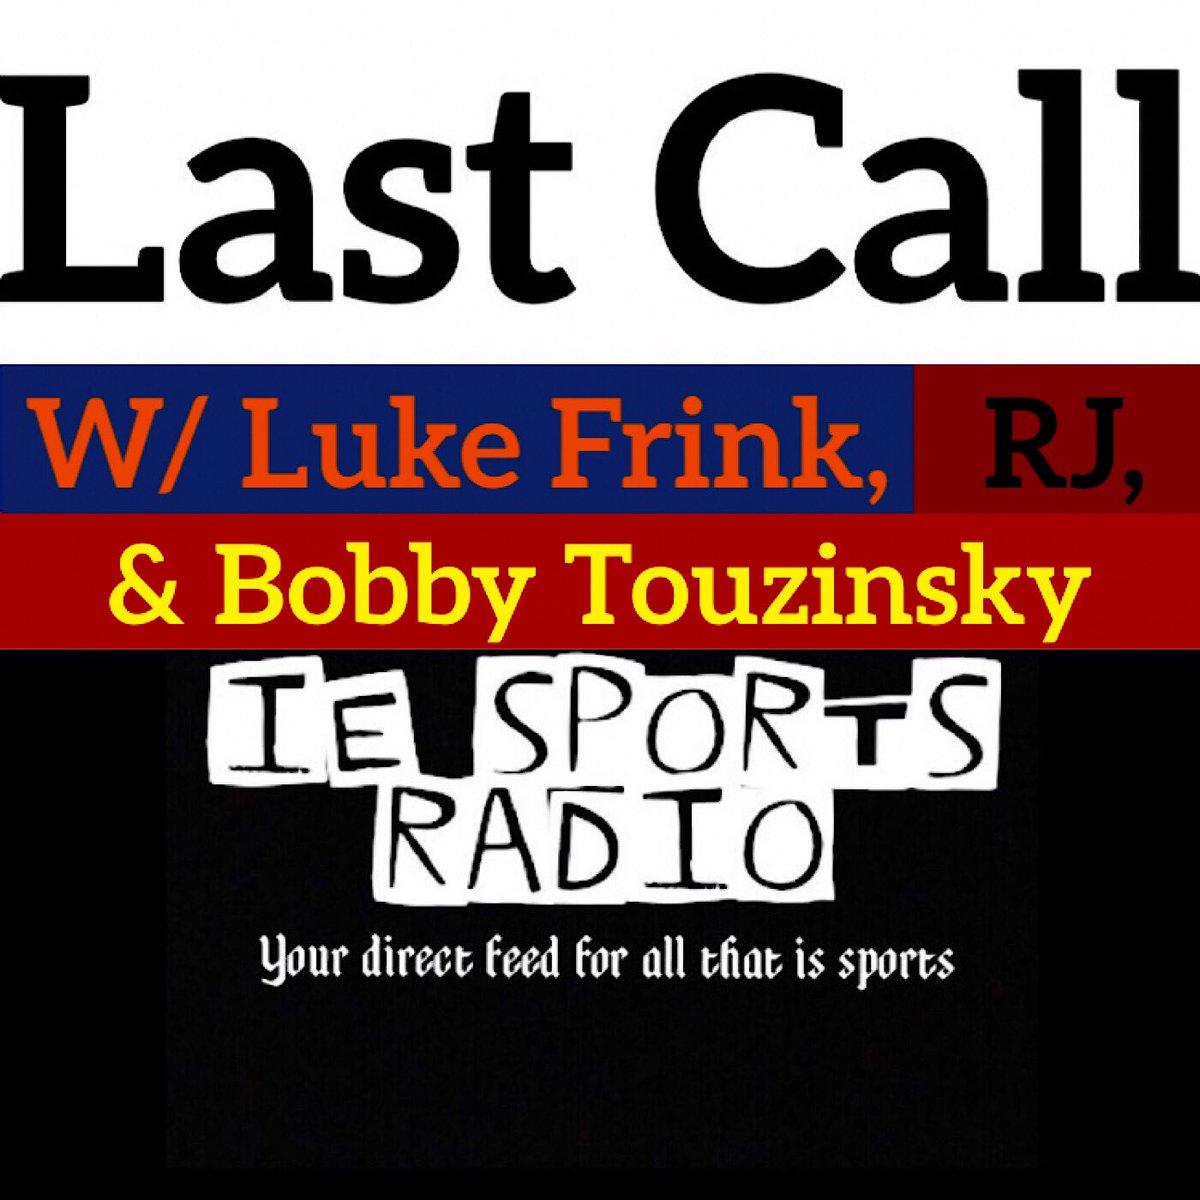 Next Up: FRI 1/24 5pm PST/8pm EST #LastCall with @RJKohlstedt2 @lukefrink05 & @BobTouzinsky #NFL #NFL100 #NFLPlayoffs #ChampionshipWeekend #MLB #EverybodyIn #ChangeTheGame #Bears100#NBA#BullsNation #NHL #STLBlues #Blackhawks #AYD #RAG